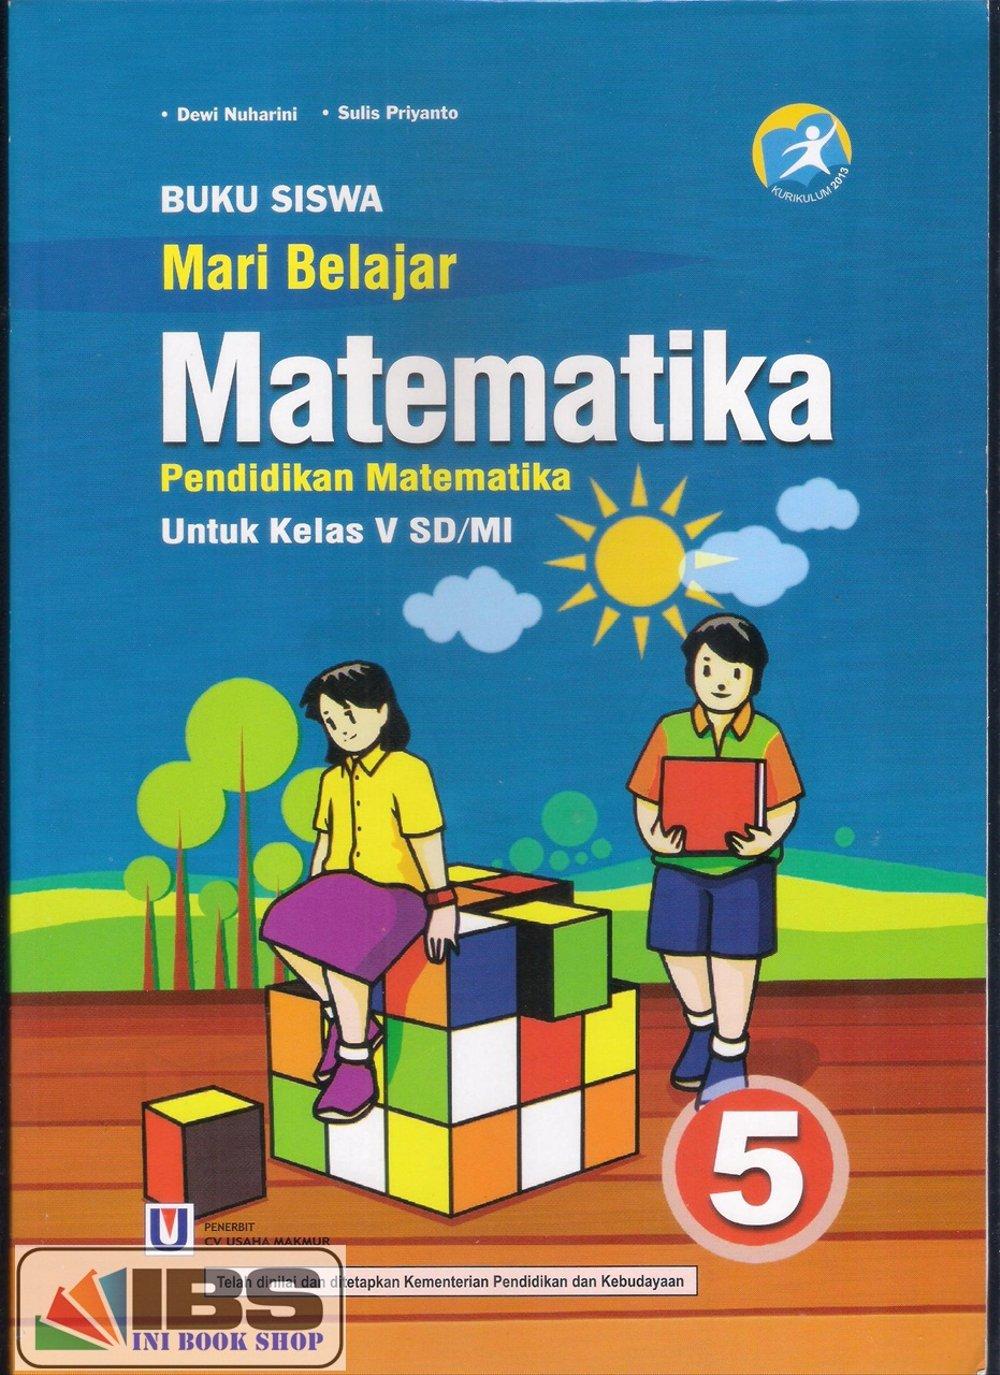 Kunci Jawaban Buku Matematika Kelas 5 Kurikulum 2013 Penerbit Mediatama Gratis